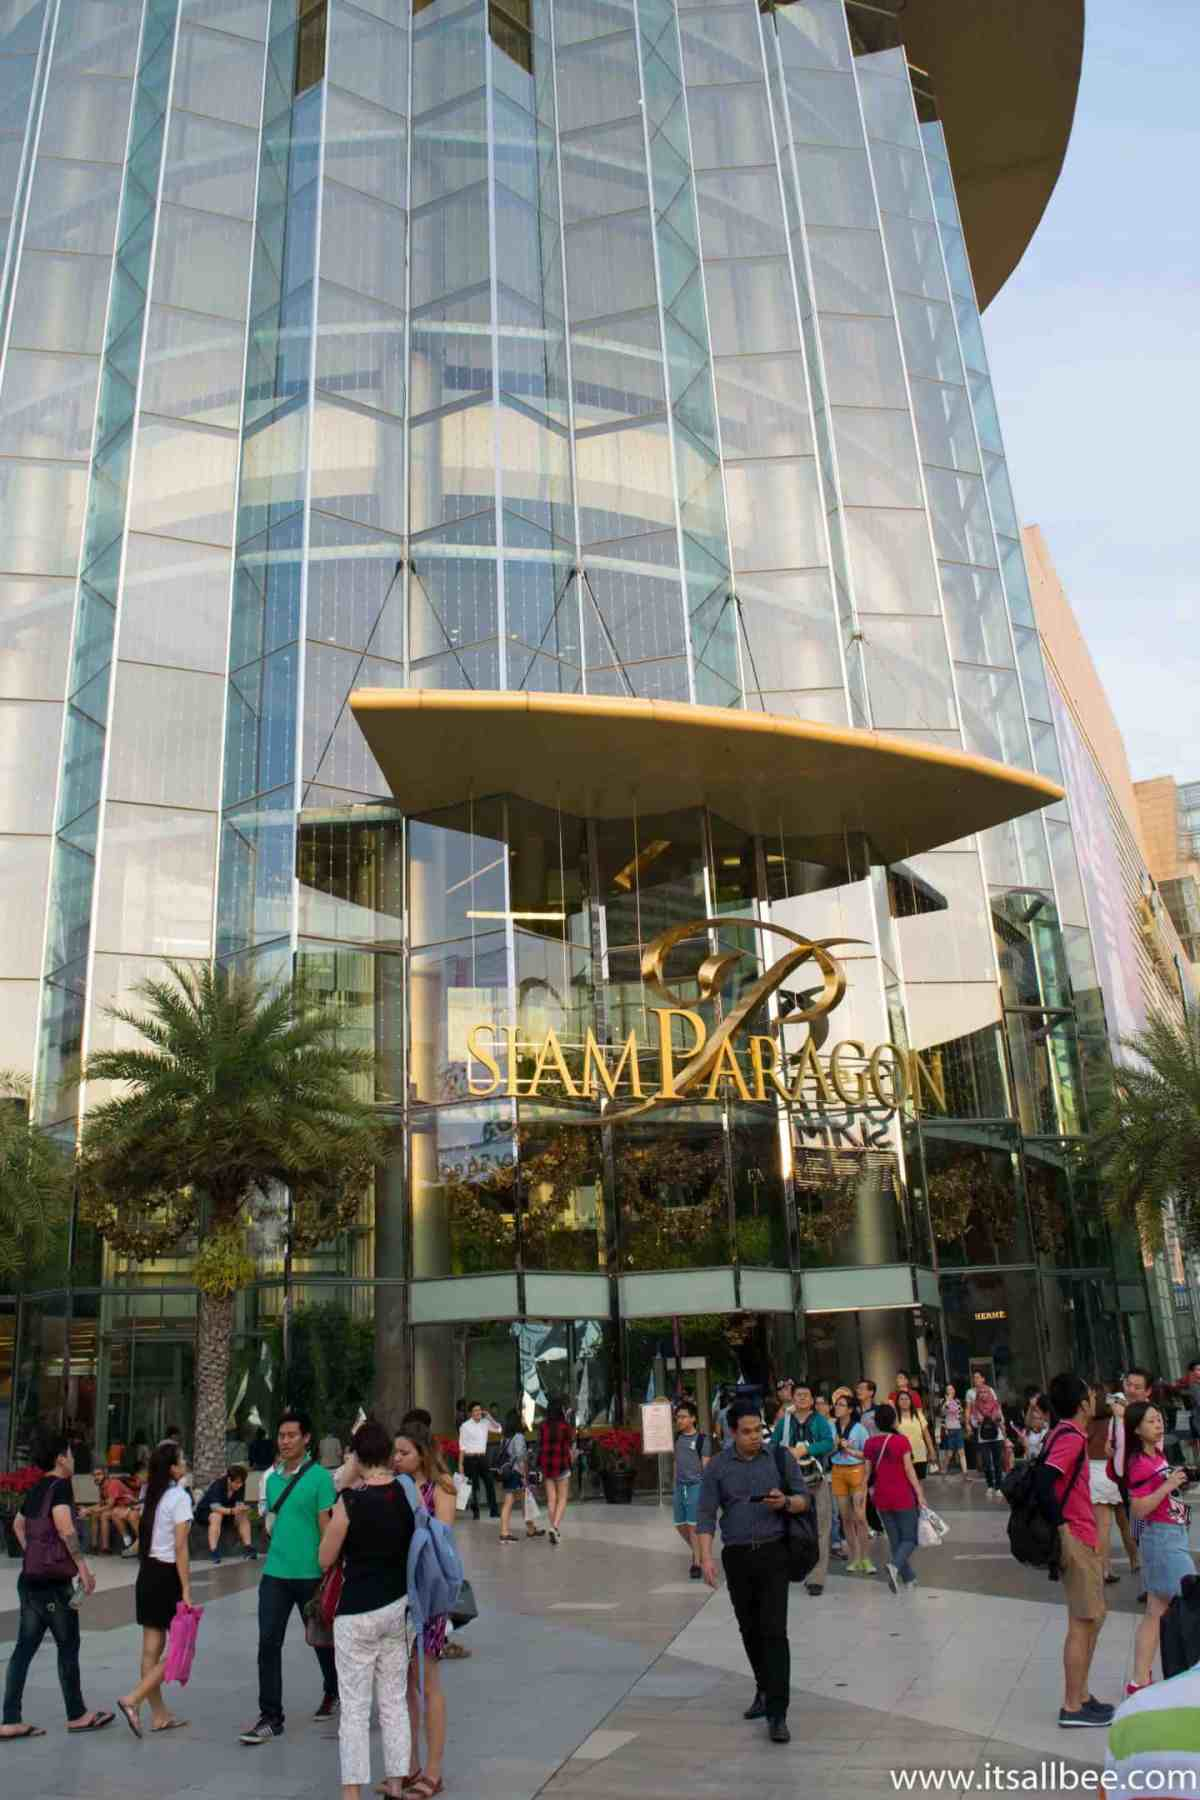 5 Reasons To Visit Bangkok And Why We Fell In Love With The Thai City - Bangkok Shopping Markets and Malls